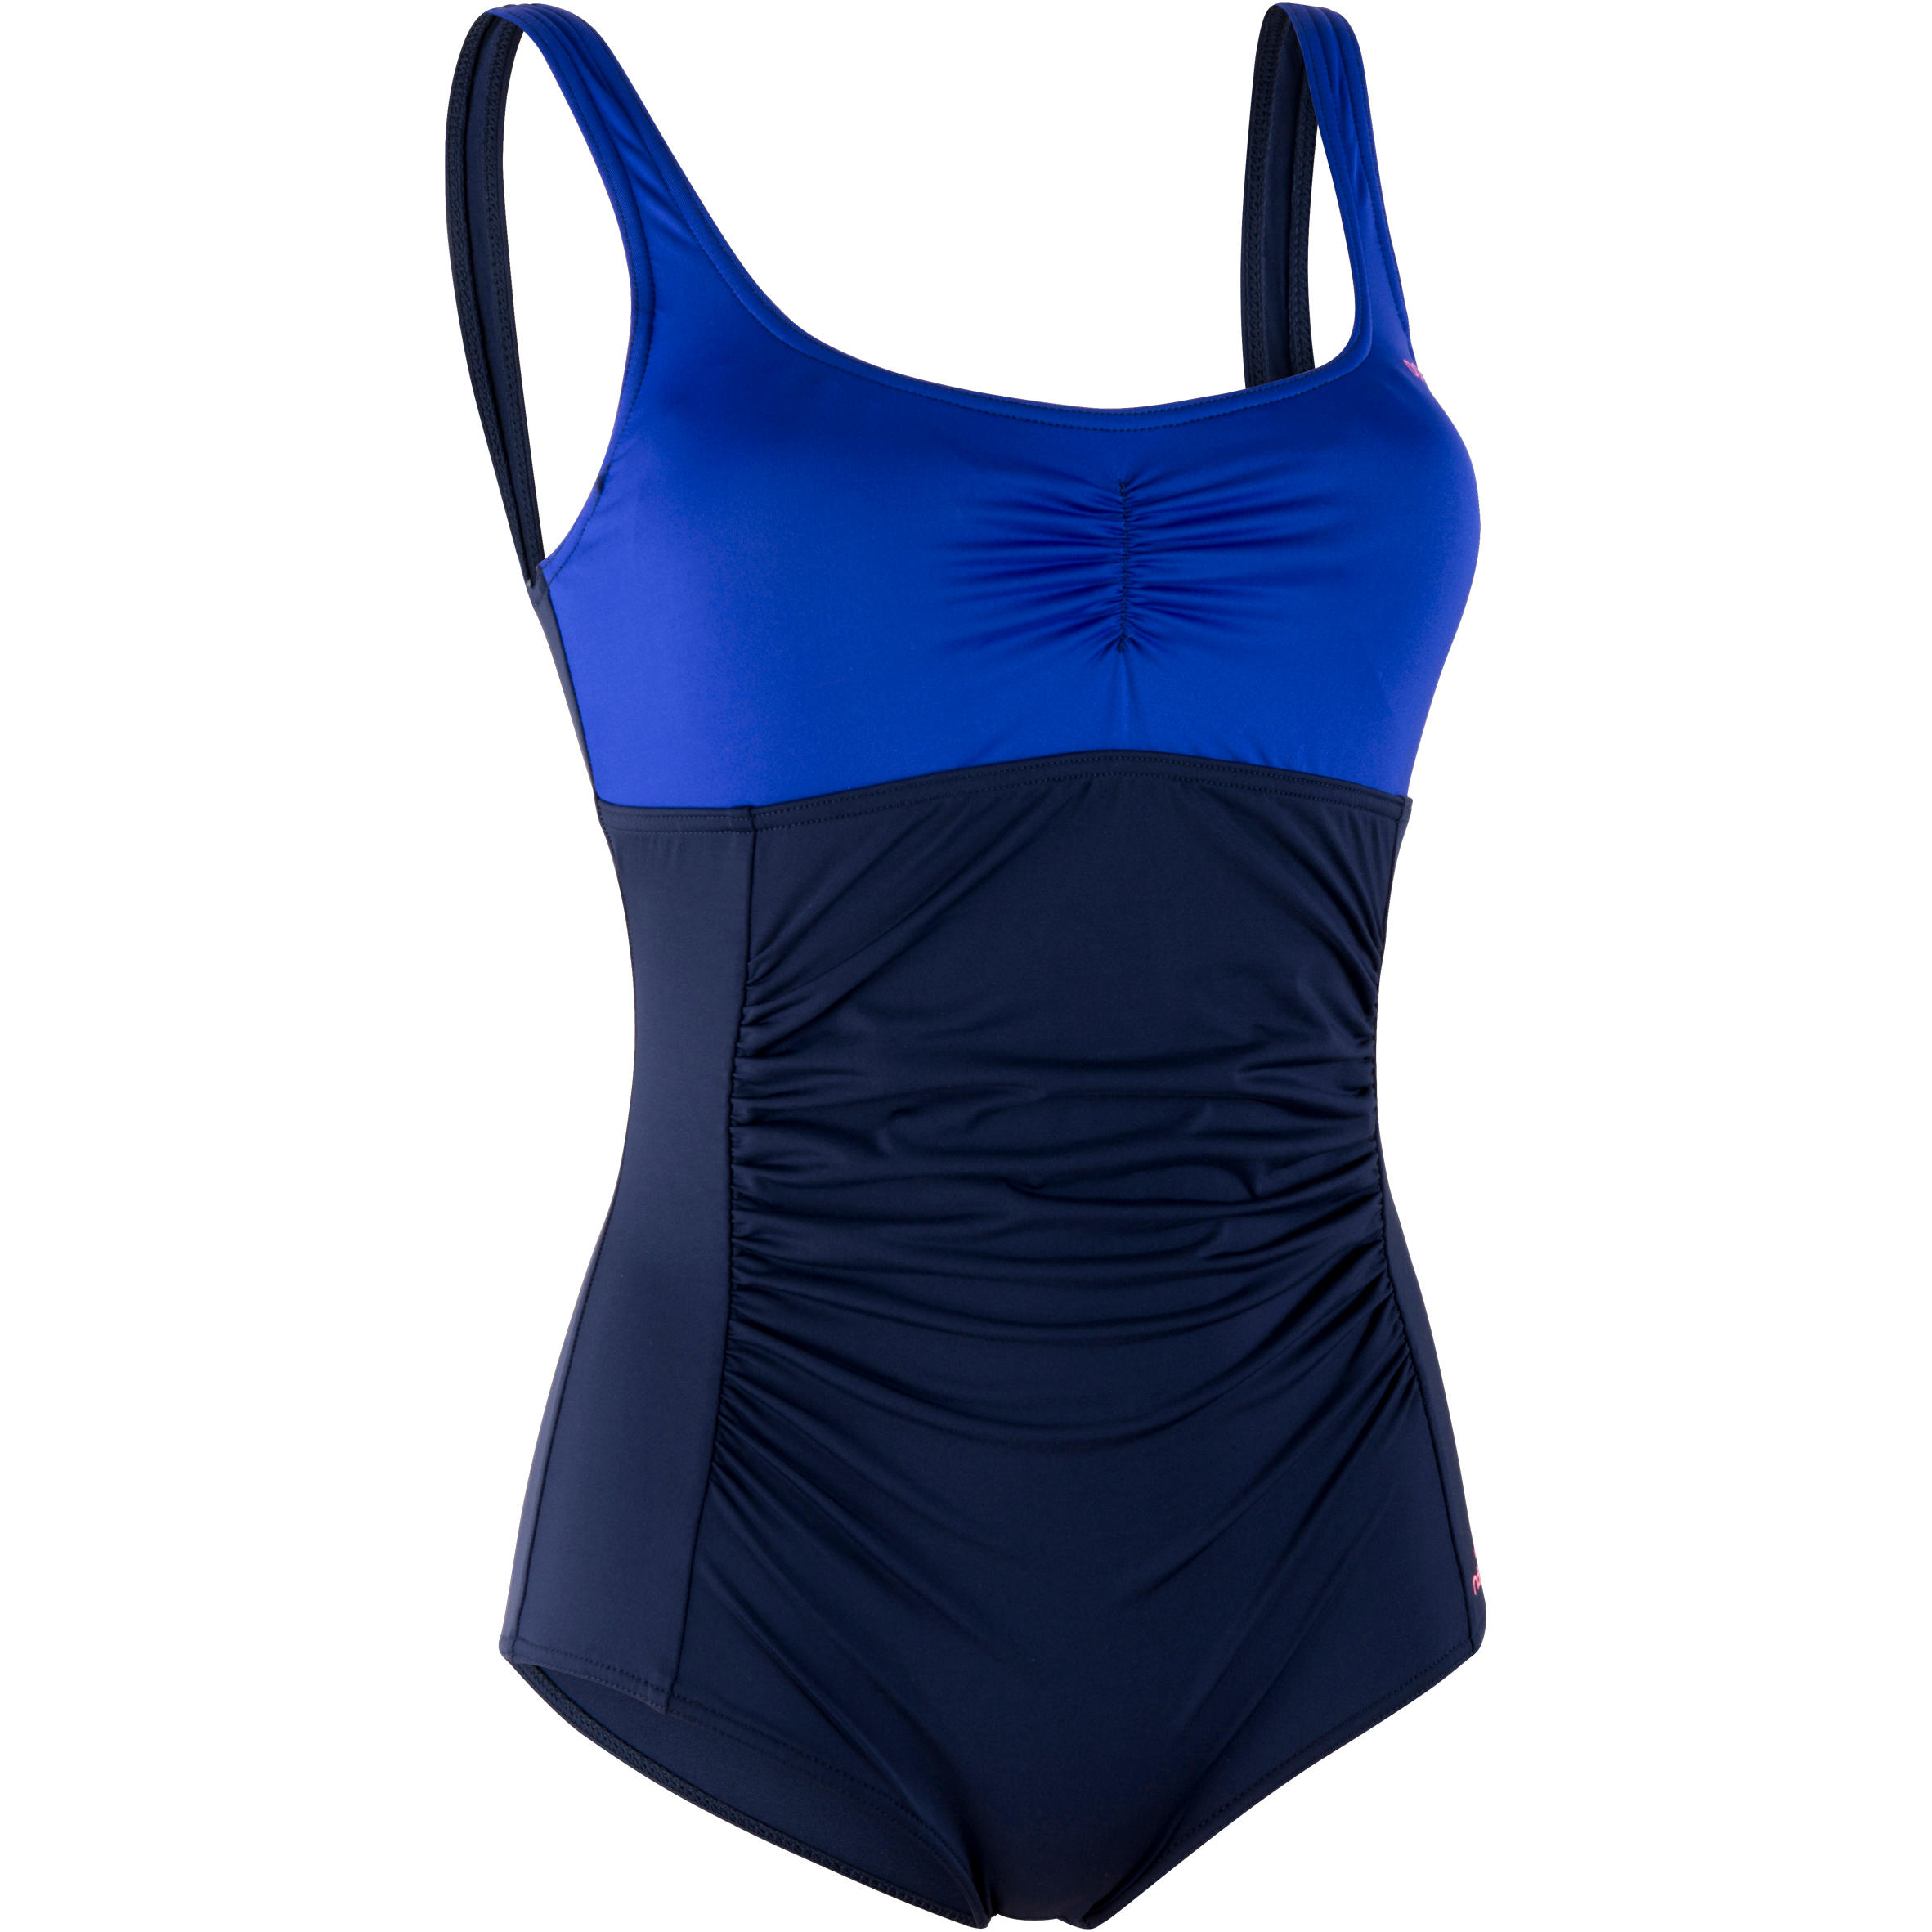 Mary One-Piece Women's Body-Sculpting Aquafitness Swimsuit - Blue